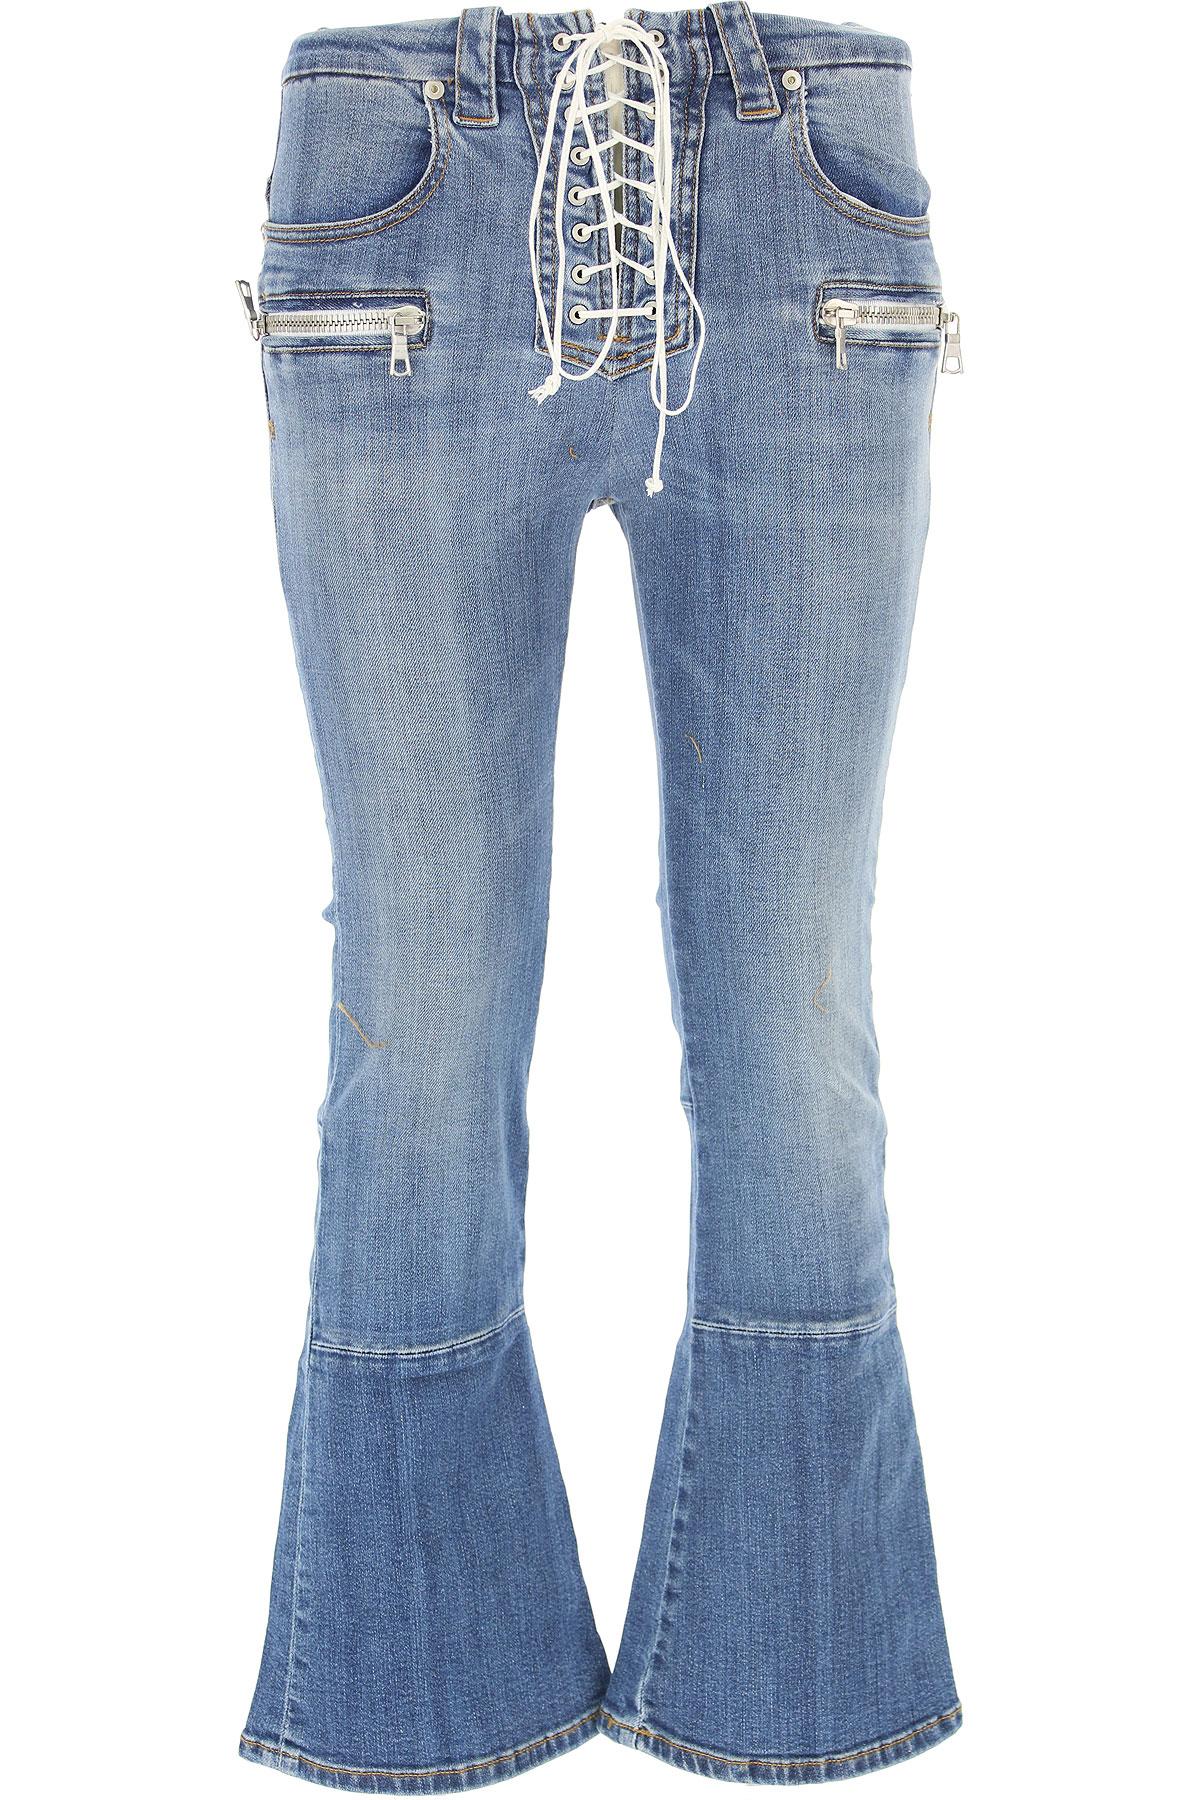 Image of Unravel Project Jeans, Blue, Cotton, 2017, 26 27